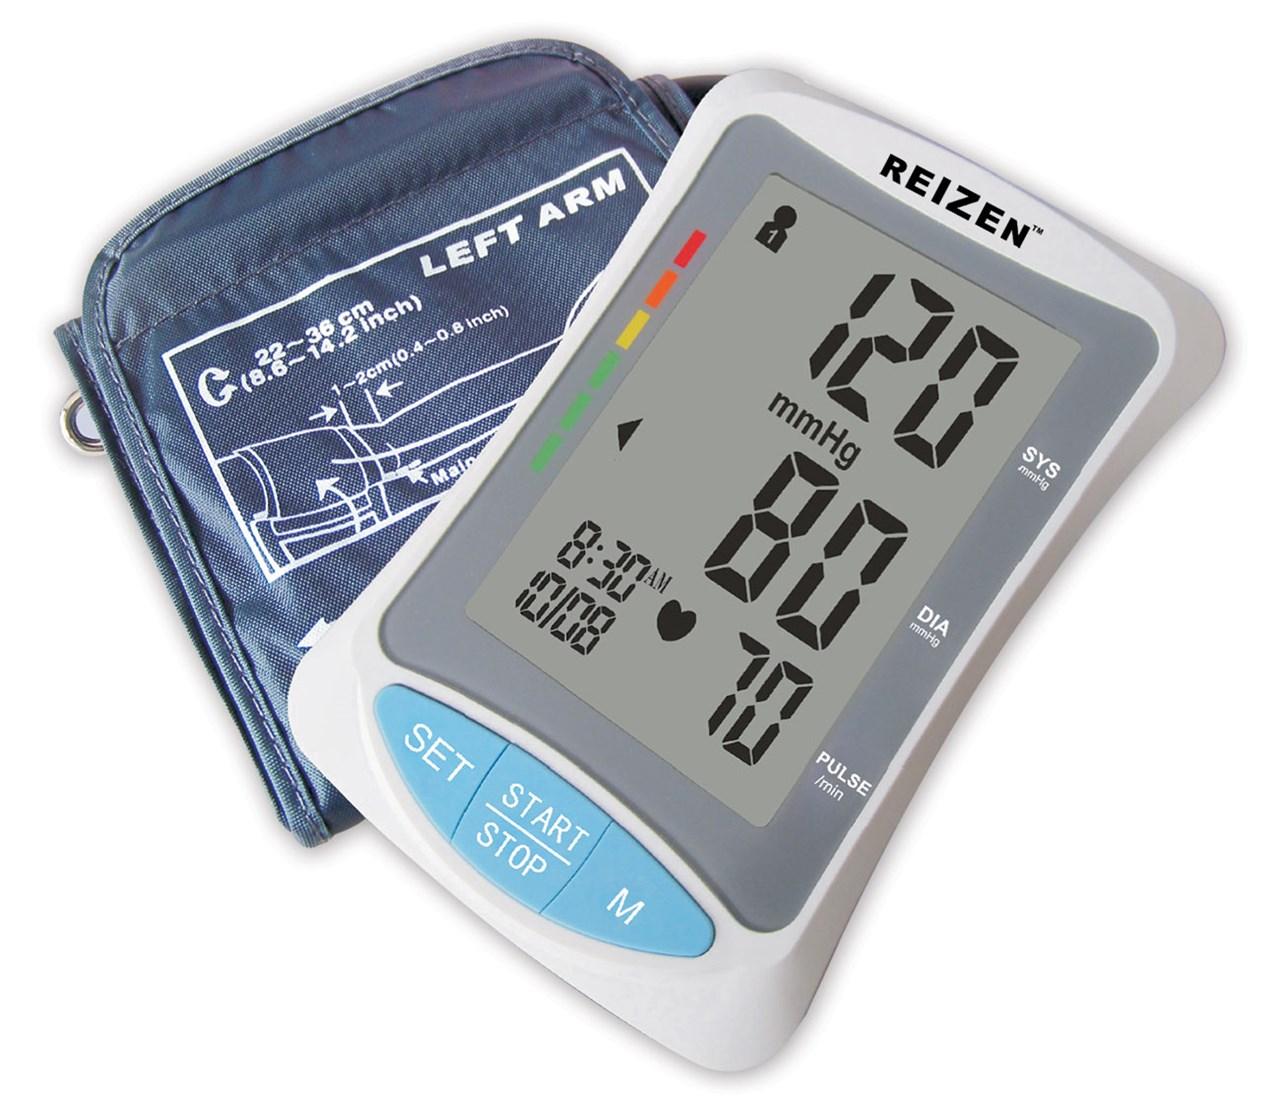 Talking Arm-Type Blood Pressure Monitor- English+Spanish